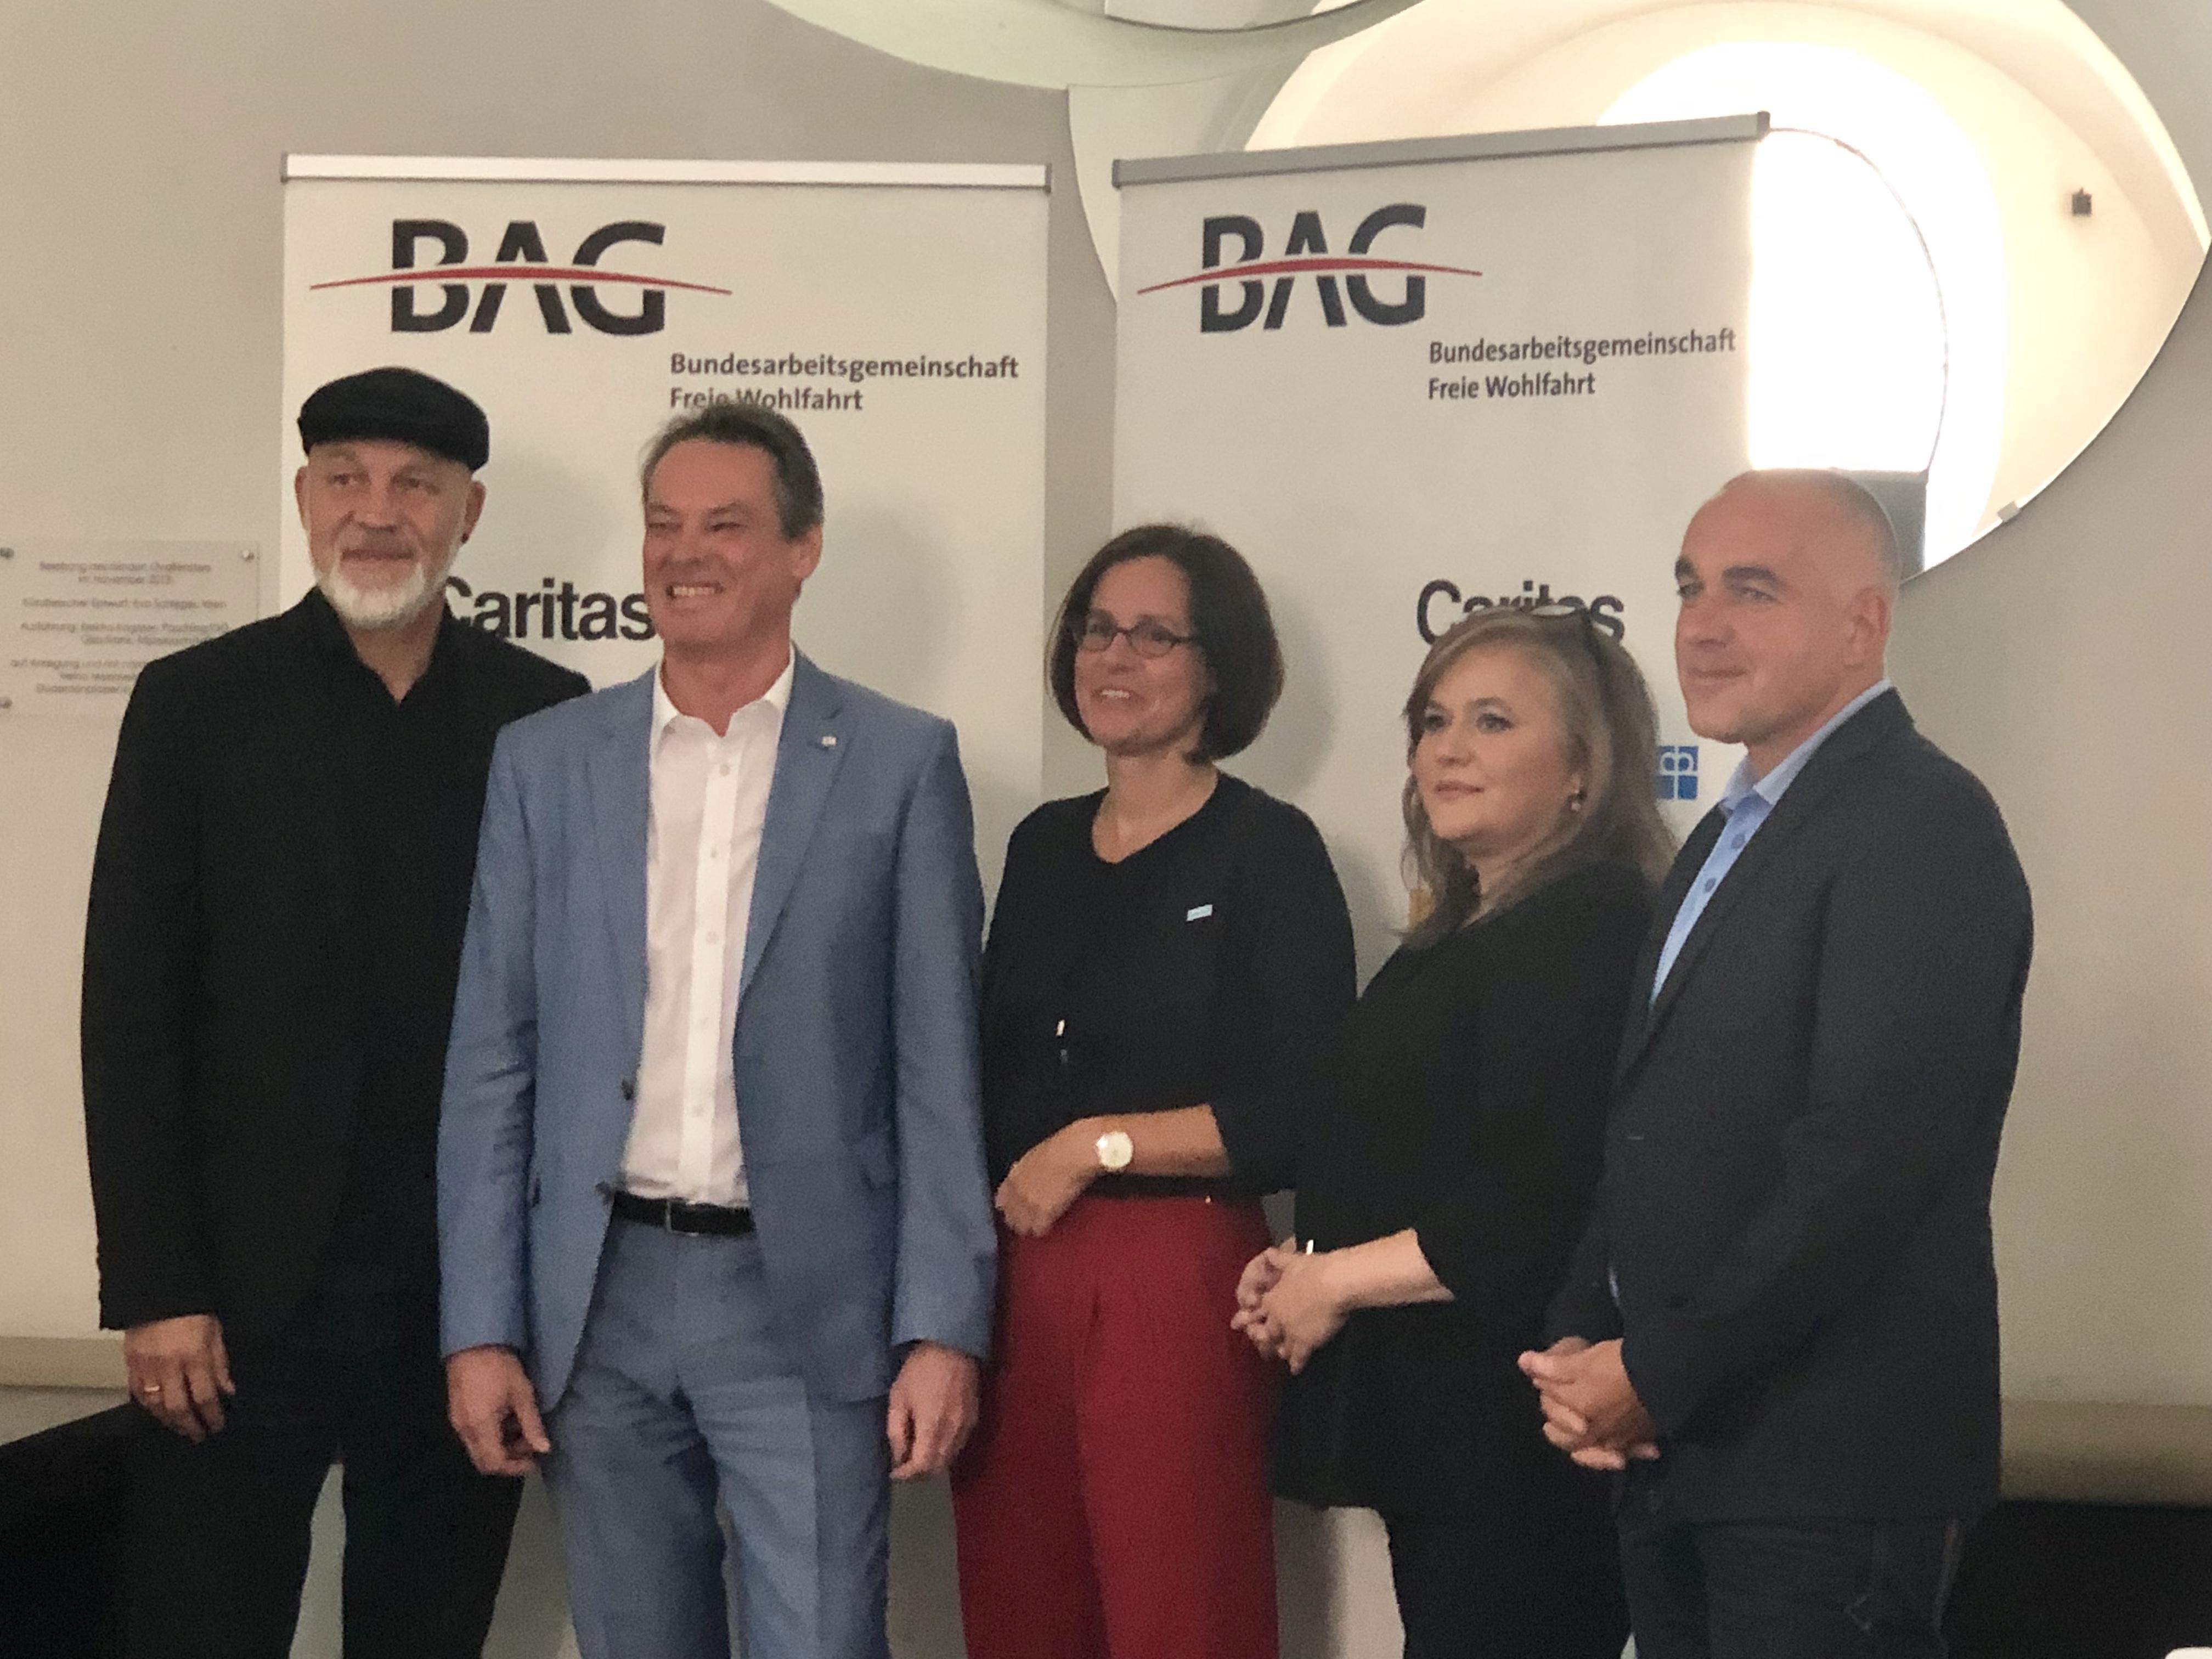 Erich Fenninger, Michael Opriesnig, Maria Katharina Moser, Bernd Wachter, Elisabeth Anselm (v.L.n.R.)